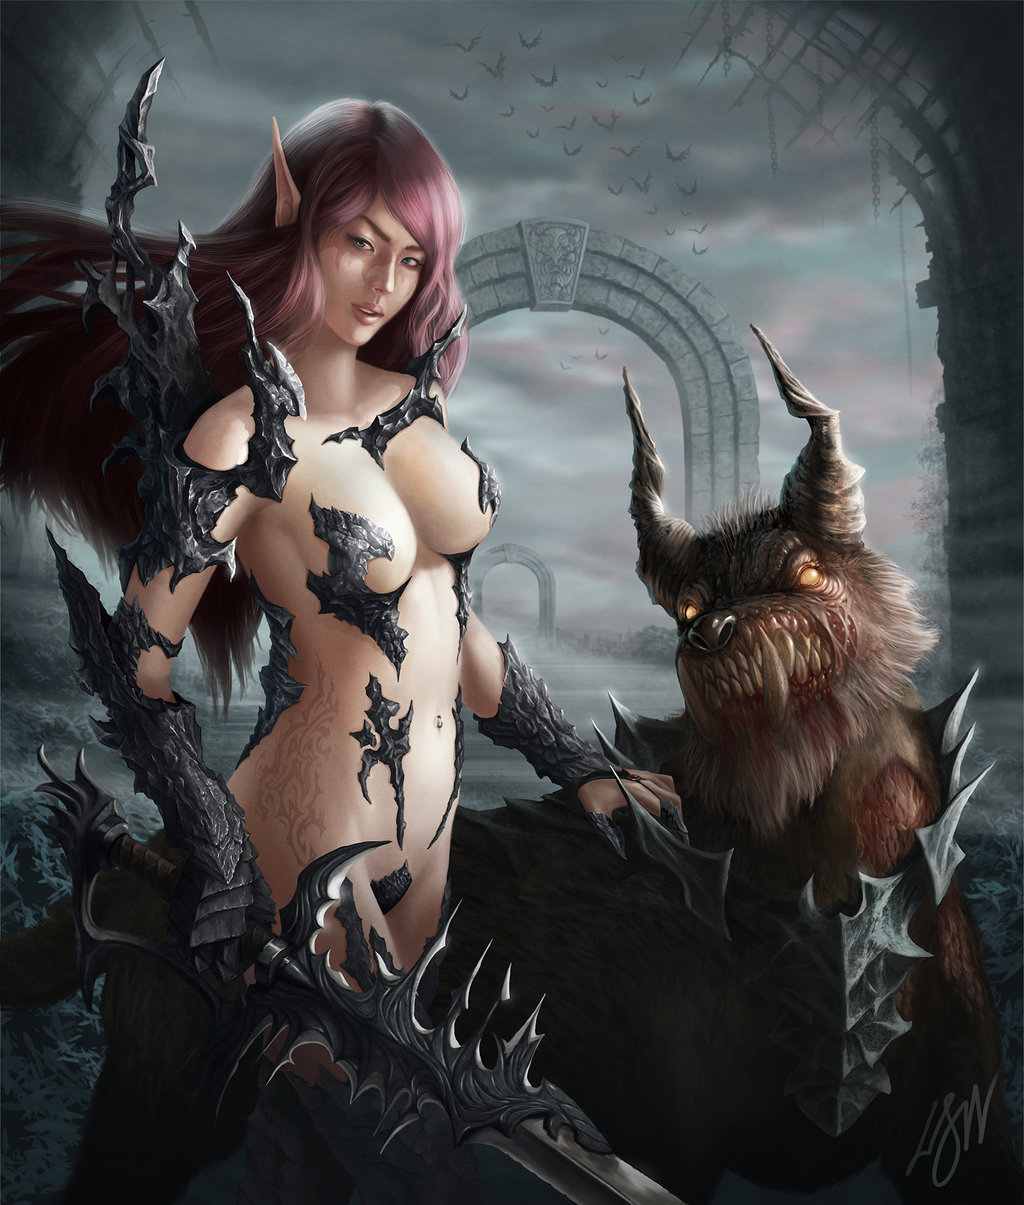 The Fallen - Night Hunters